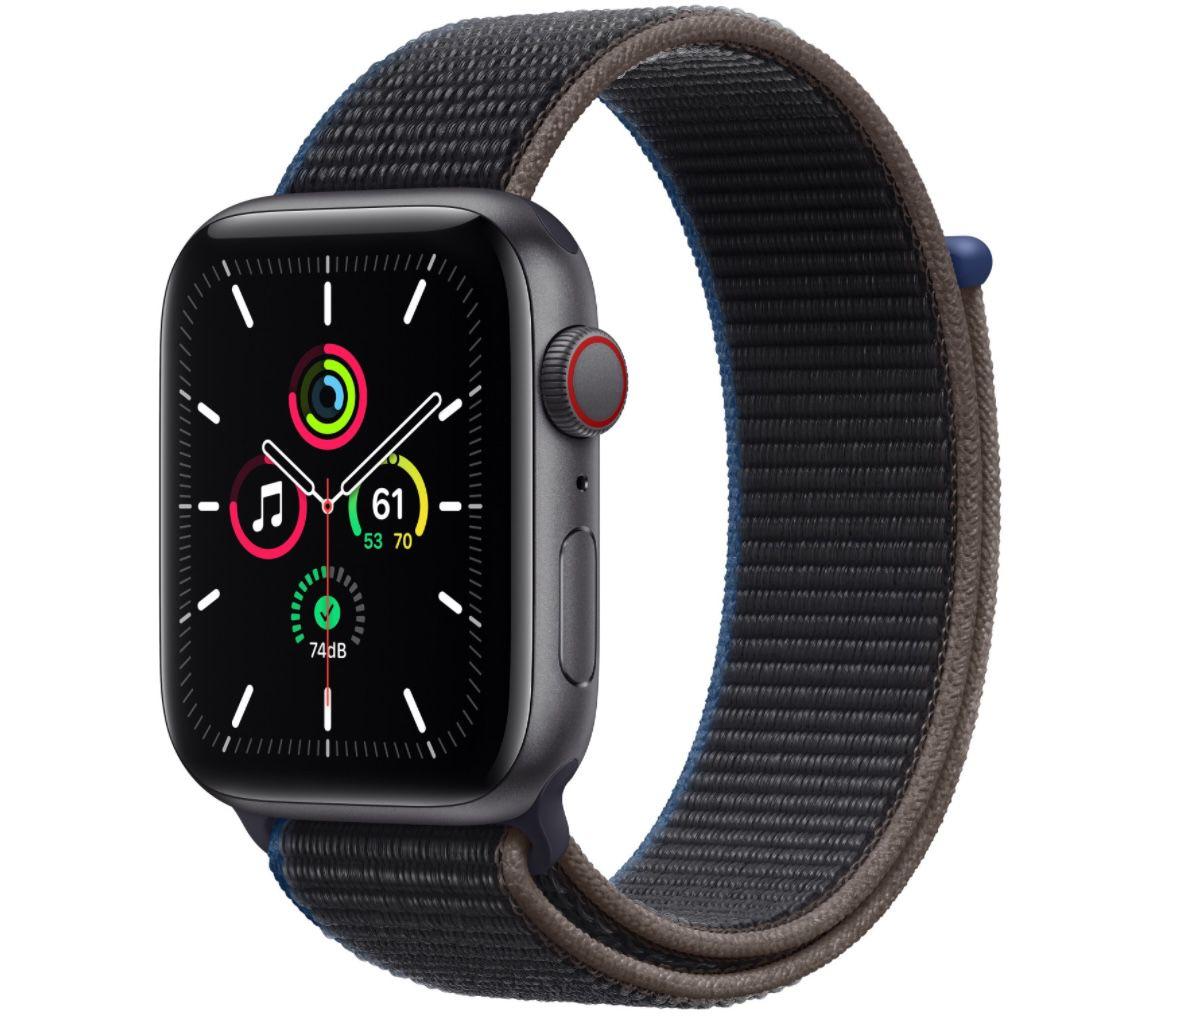 Apple Watch SE LTE in Space Grau mit 44mm inkl. Sport Loop für 309,64€ (statt 365€)